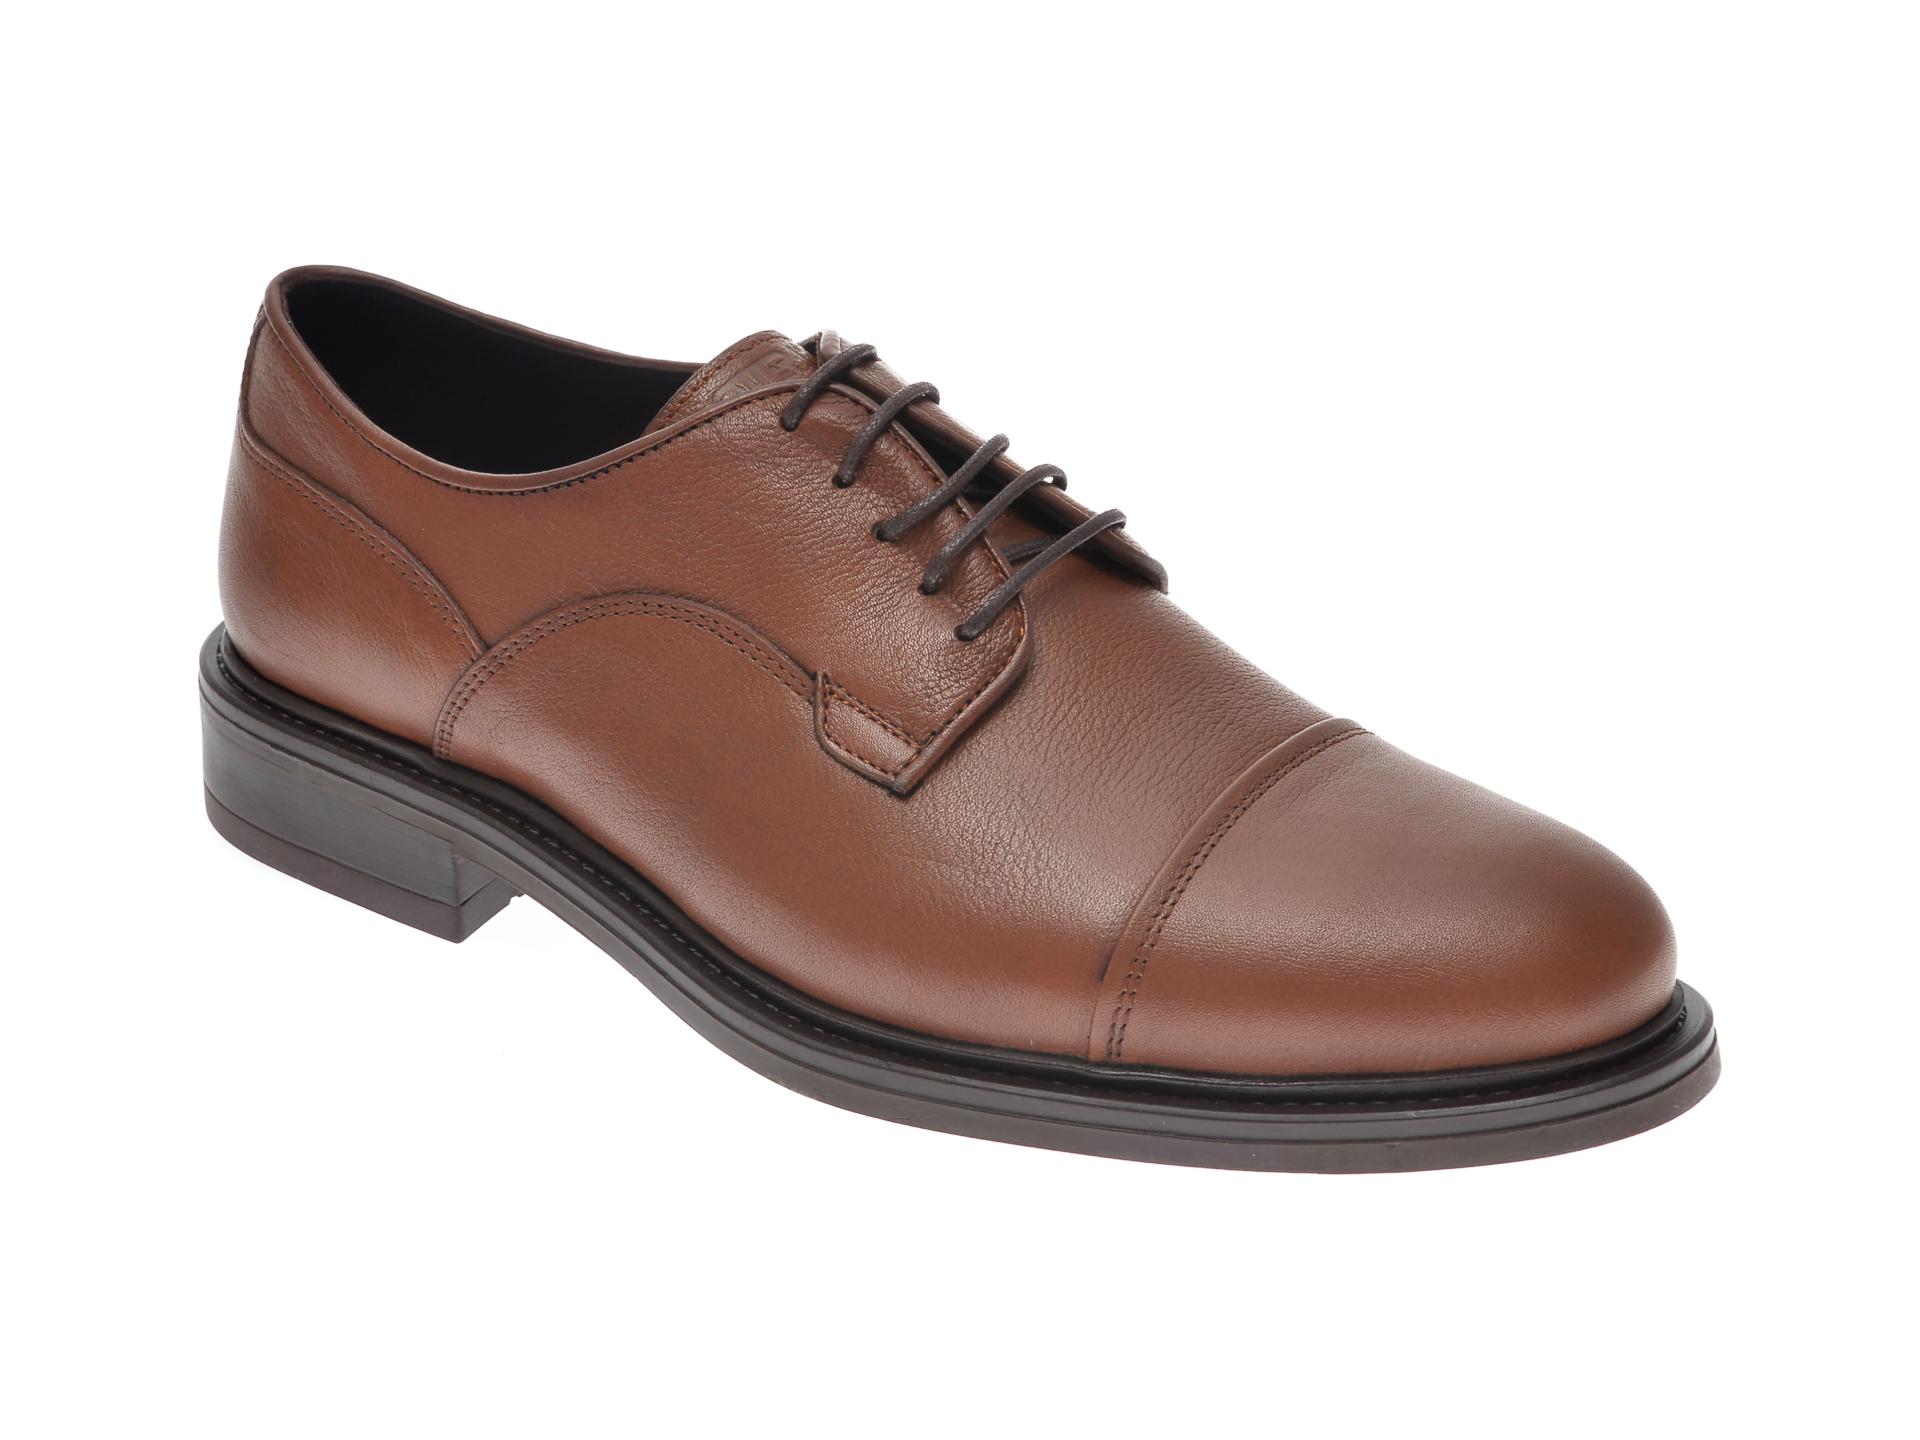 Pantofi OTTER maro, 2388, din piele naturala imagine otter.ro 2021